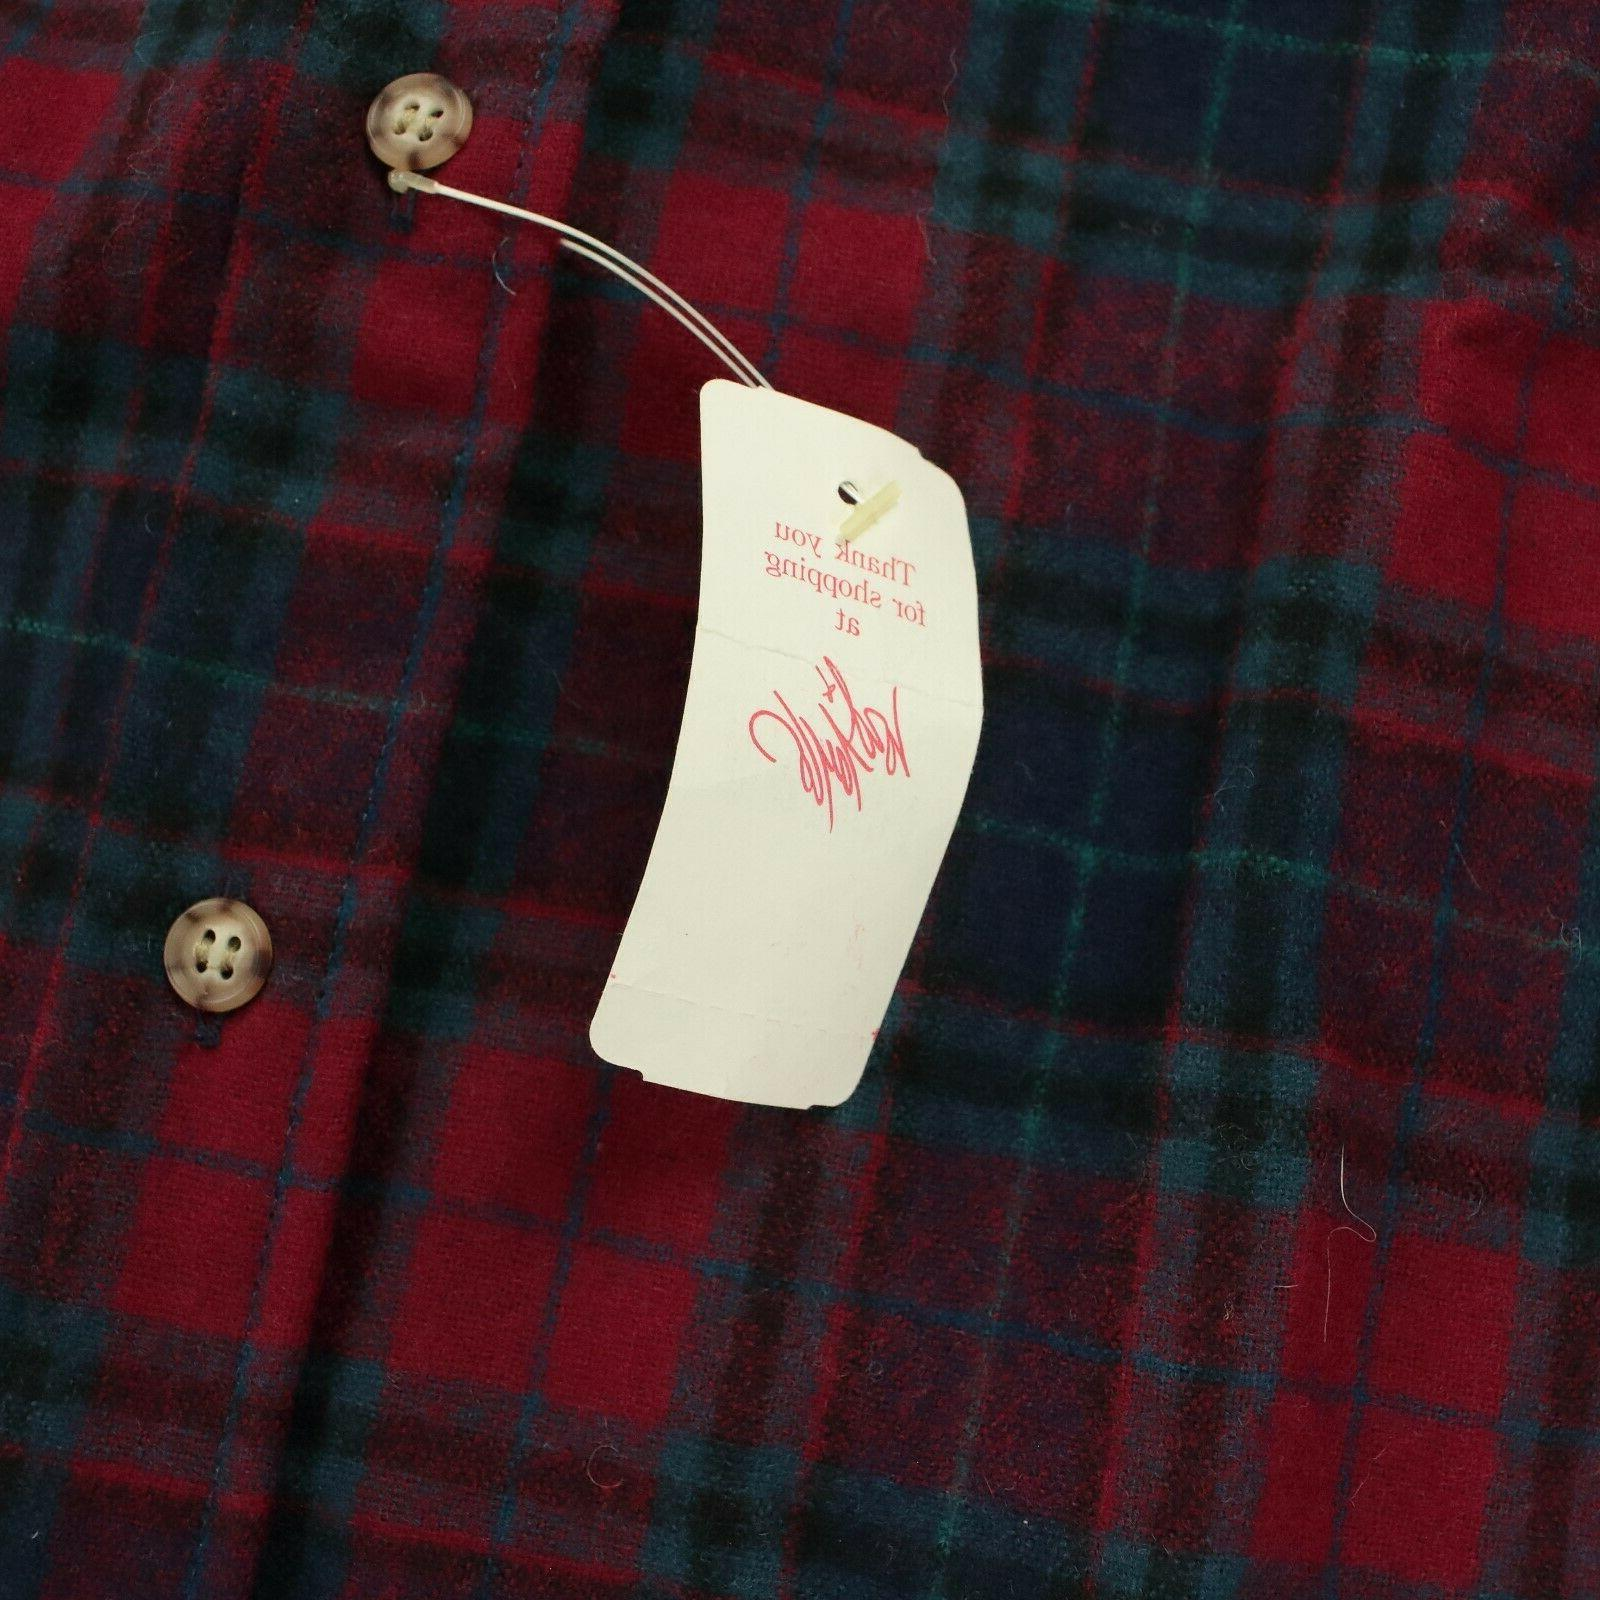 vtg DEADSTOCK usa pendleton wool flannel patch MEDIUM plaid nwt